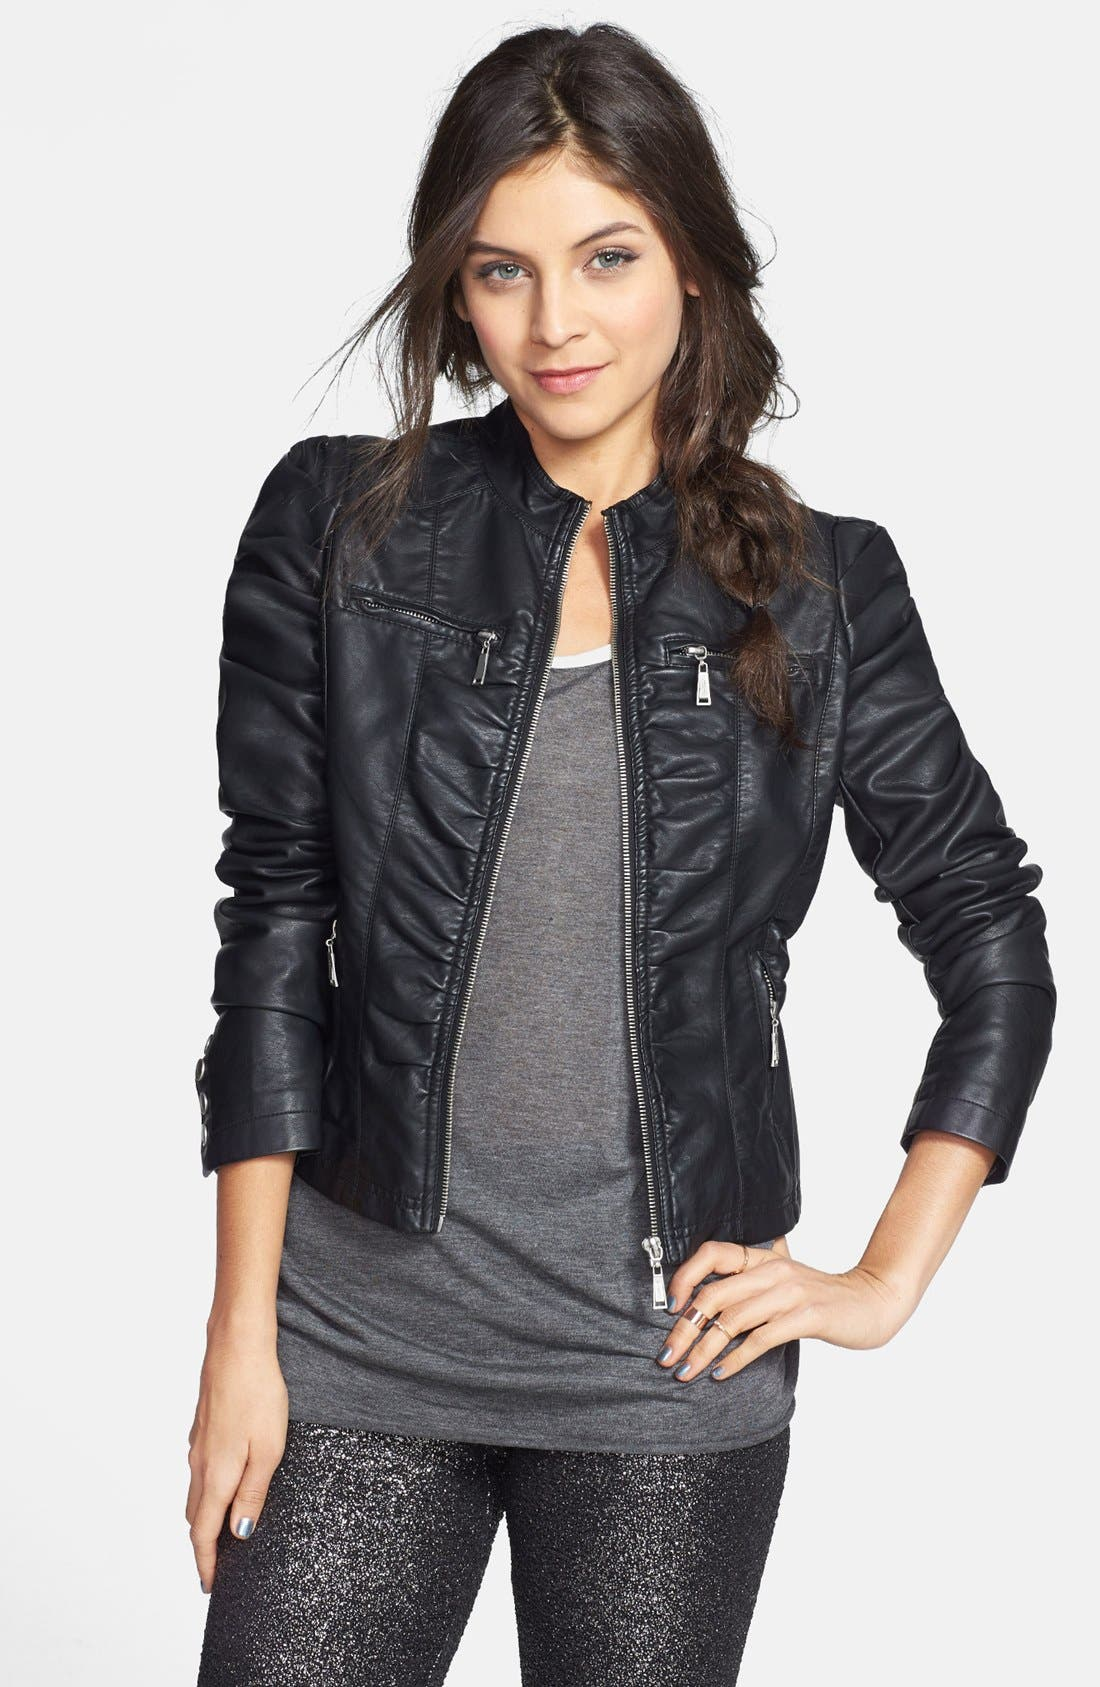 Alternate Image 1 Selected - Jou Jou Ruched Faux Leather Jacket (Juniors)